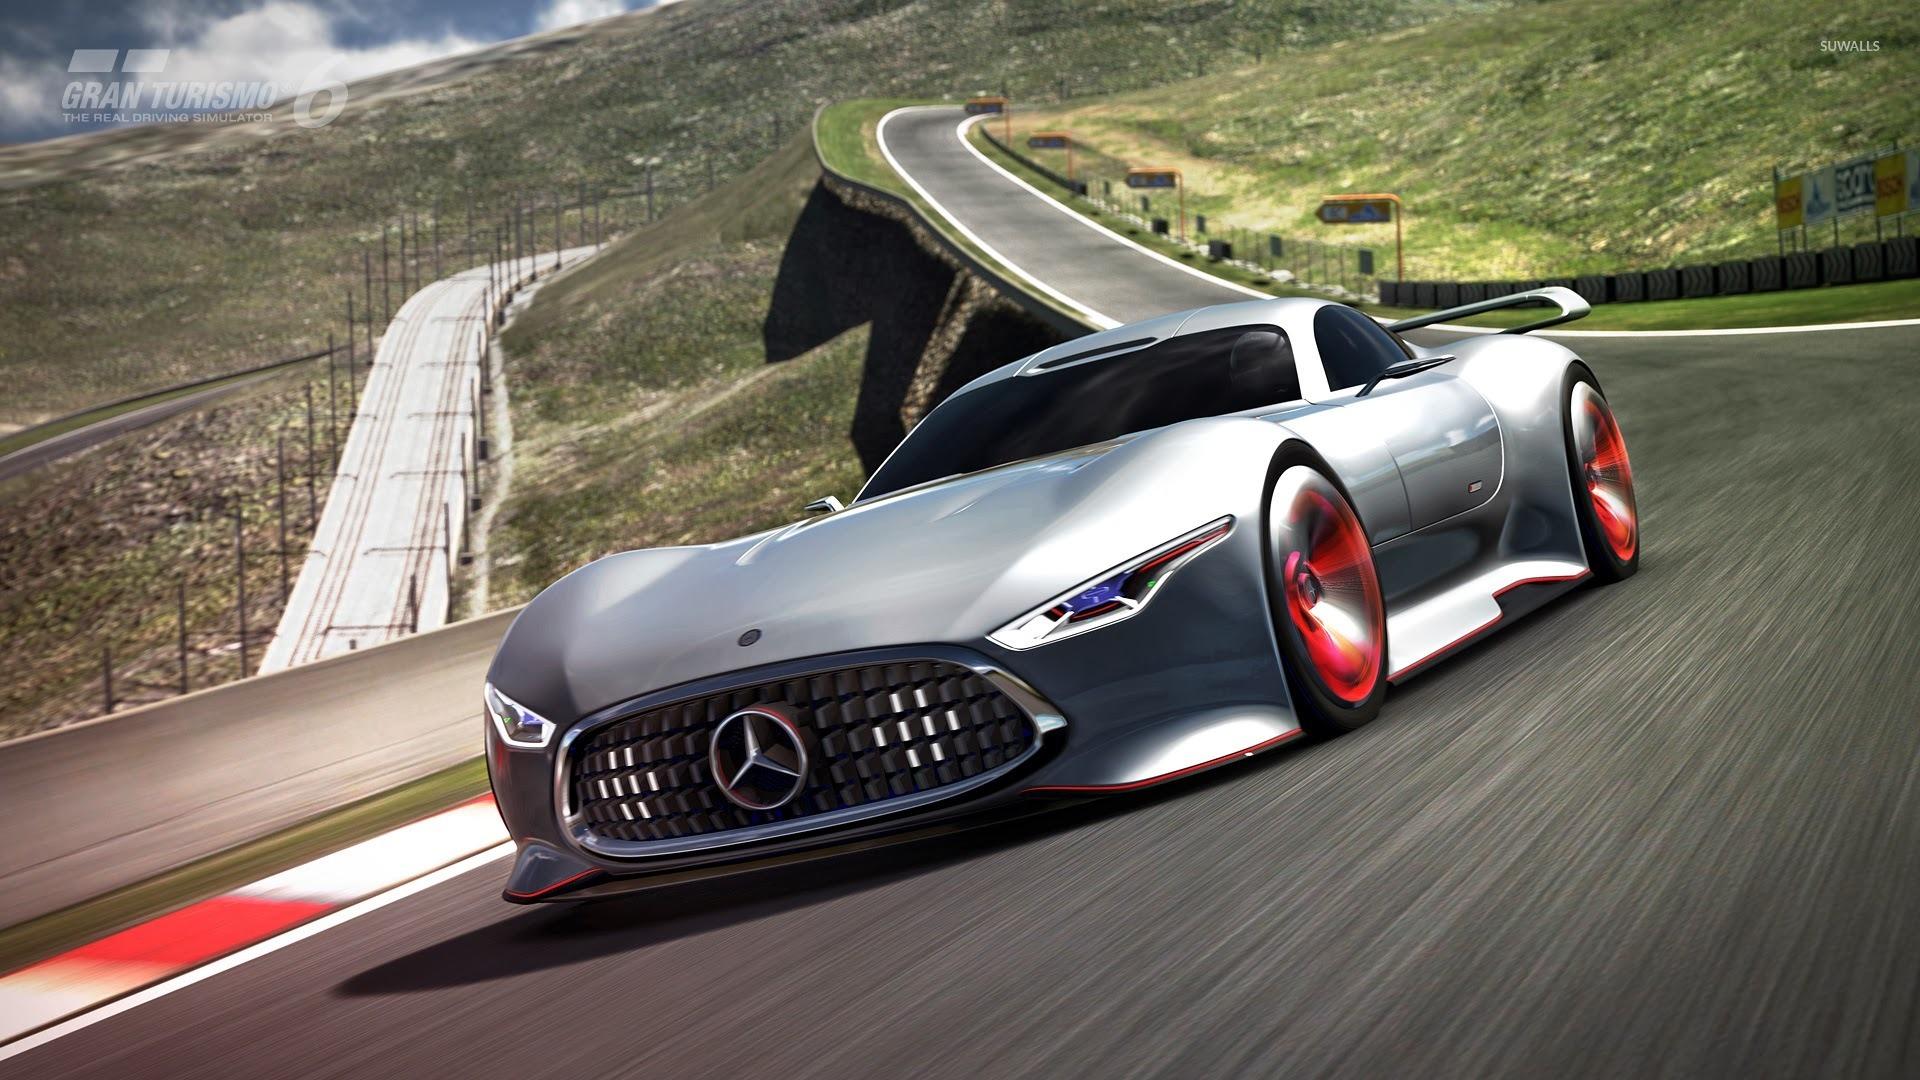 Mercedes benz amg vision gran turismo gran turismo 6 for Mercedes benz games